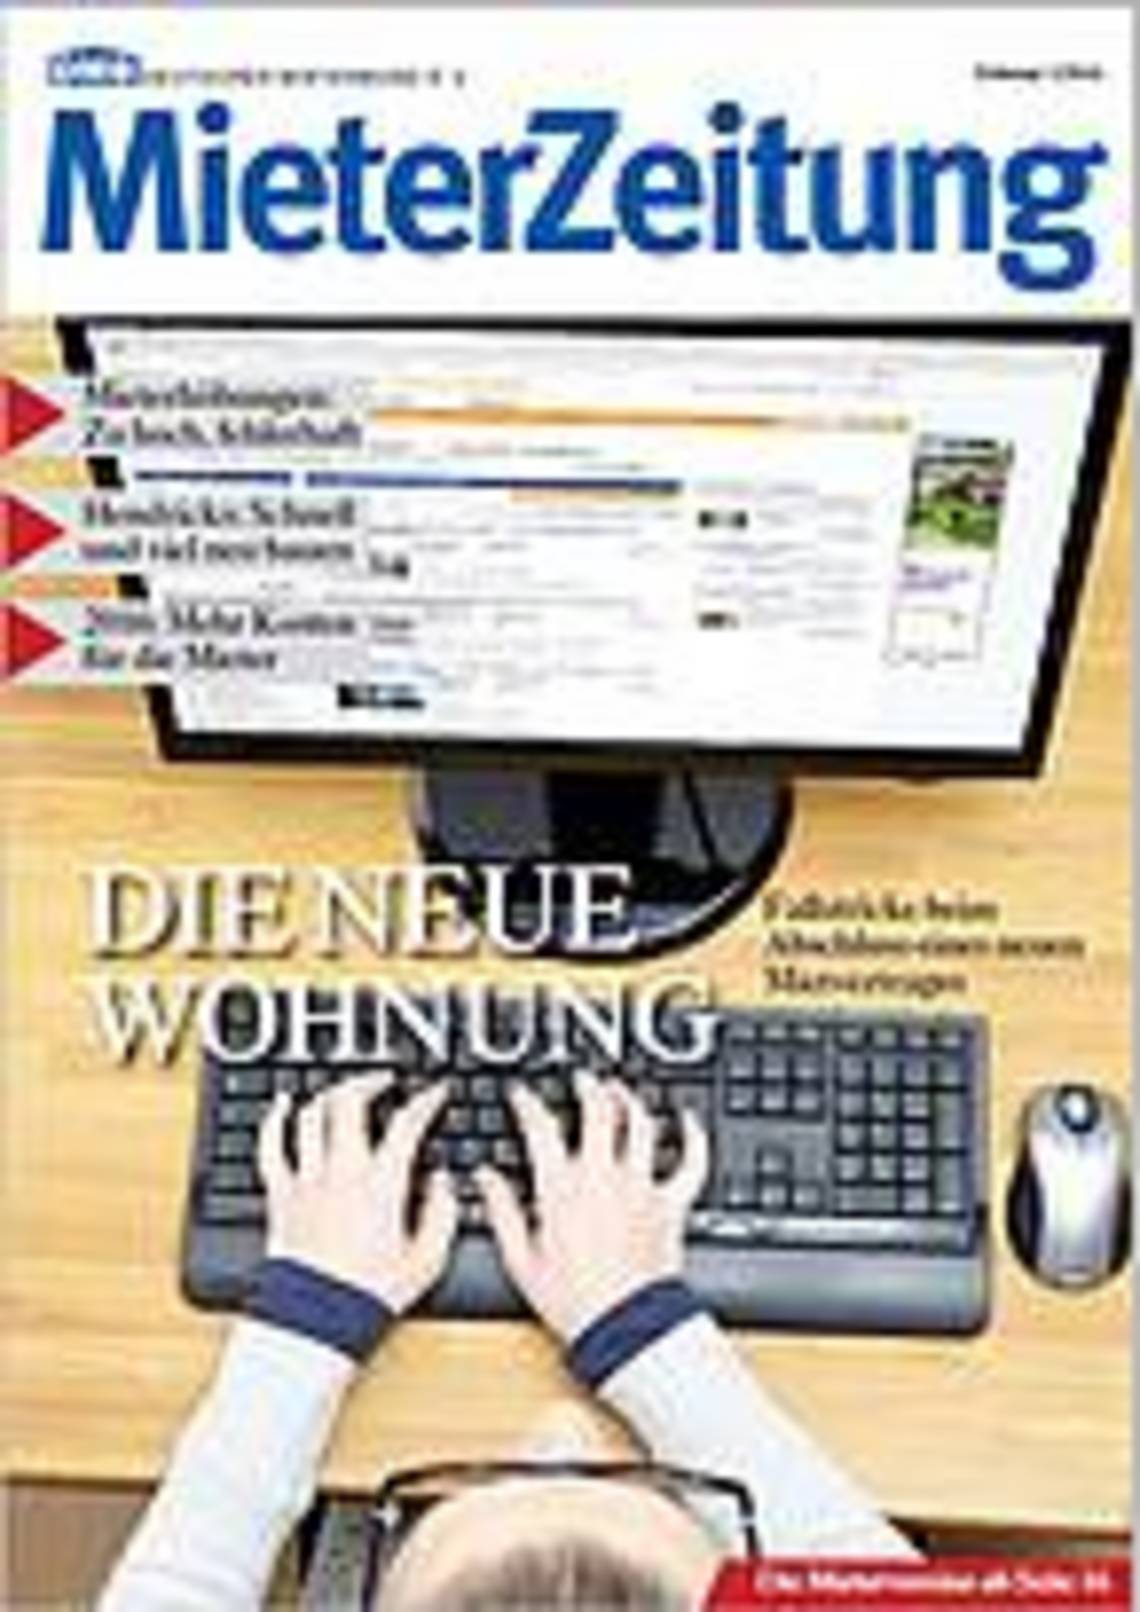 deutscher mieterbund hannover mieterzeitung mieterverein hannover mietrecht rechtsberatung. Black Bedroom Furniture Sets. Home Design Ideas